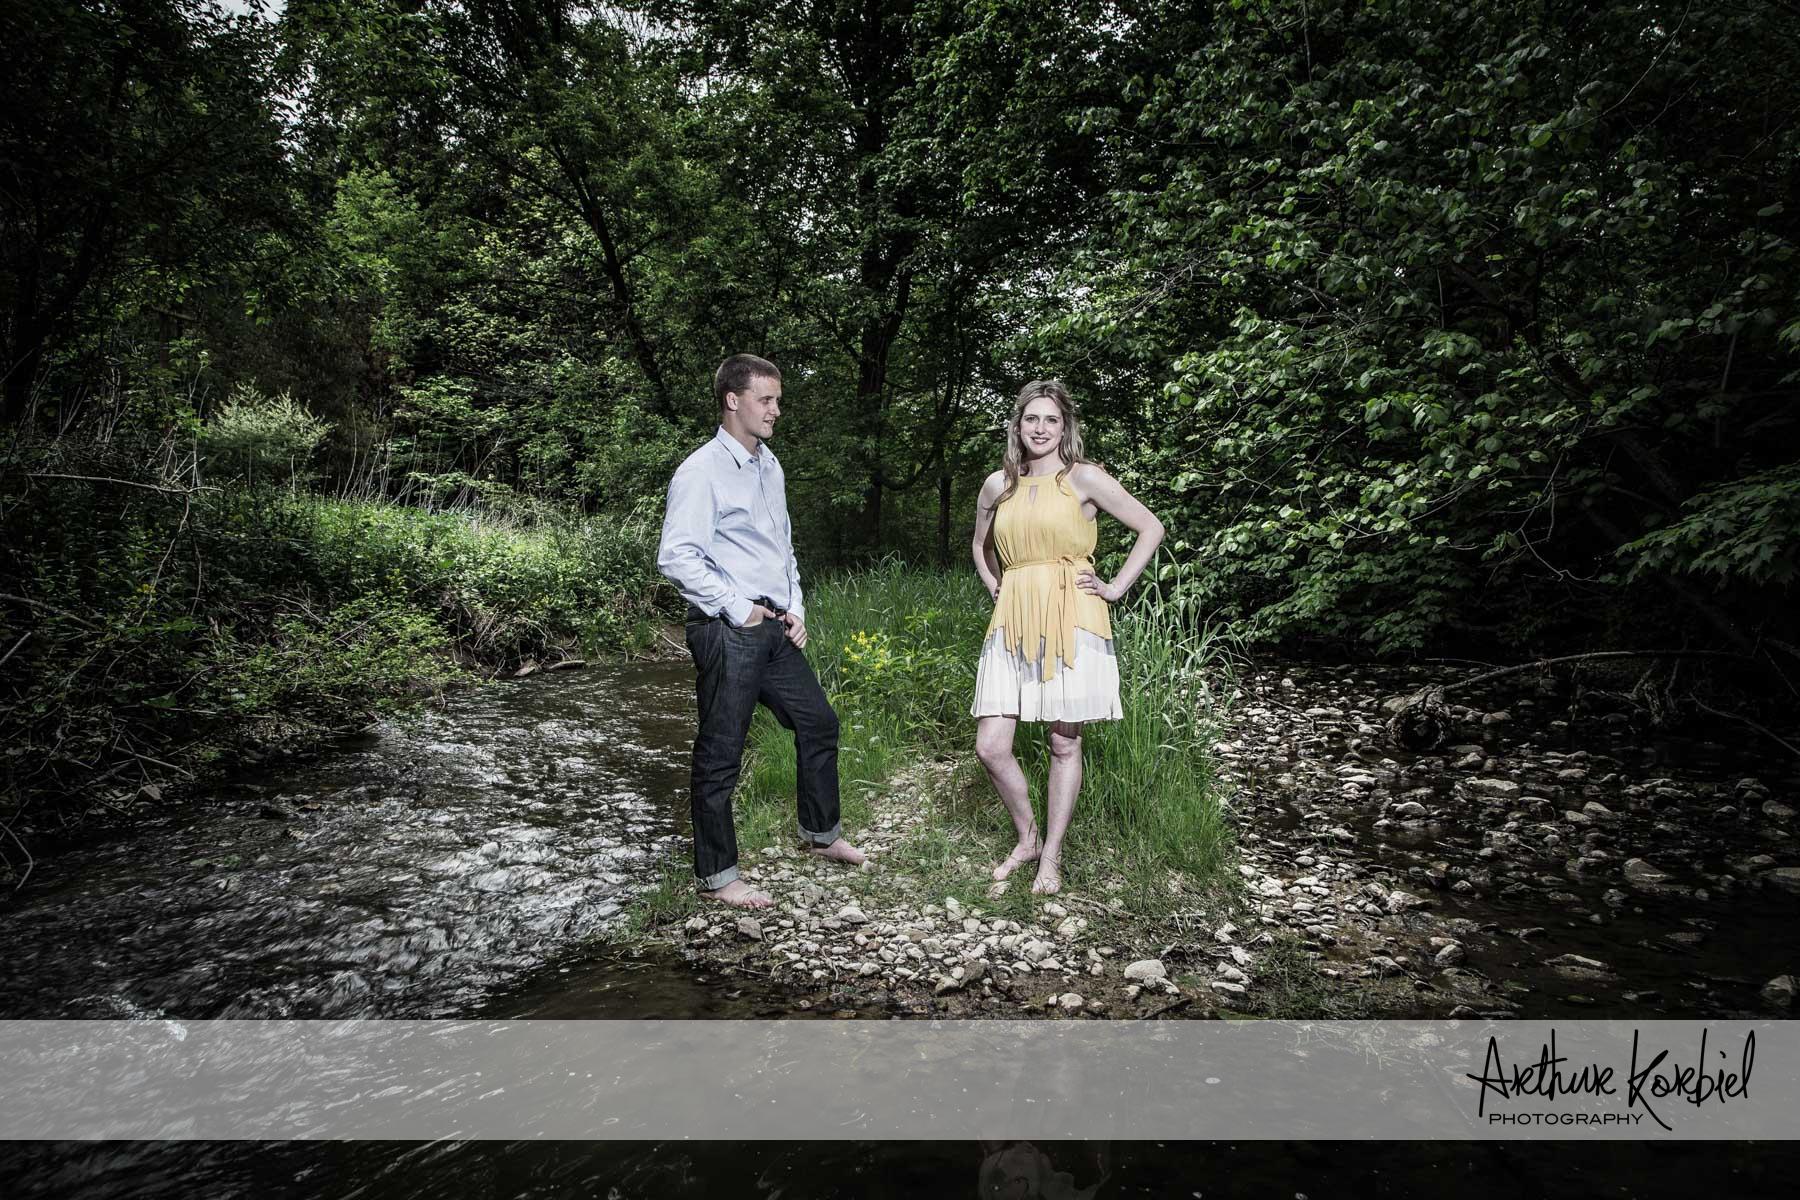 Arthur Korbiel Photography - London Engagement Photographer-023.jpg